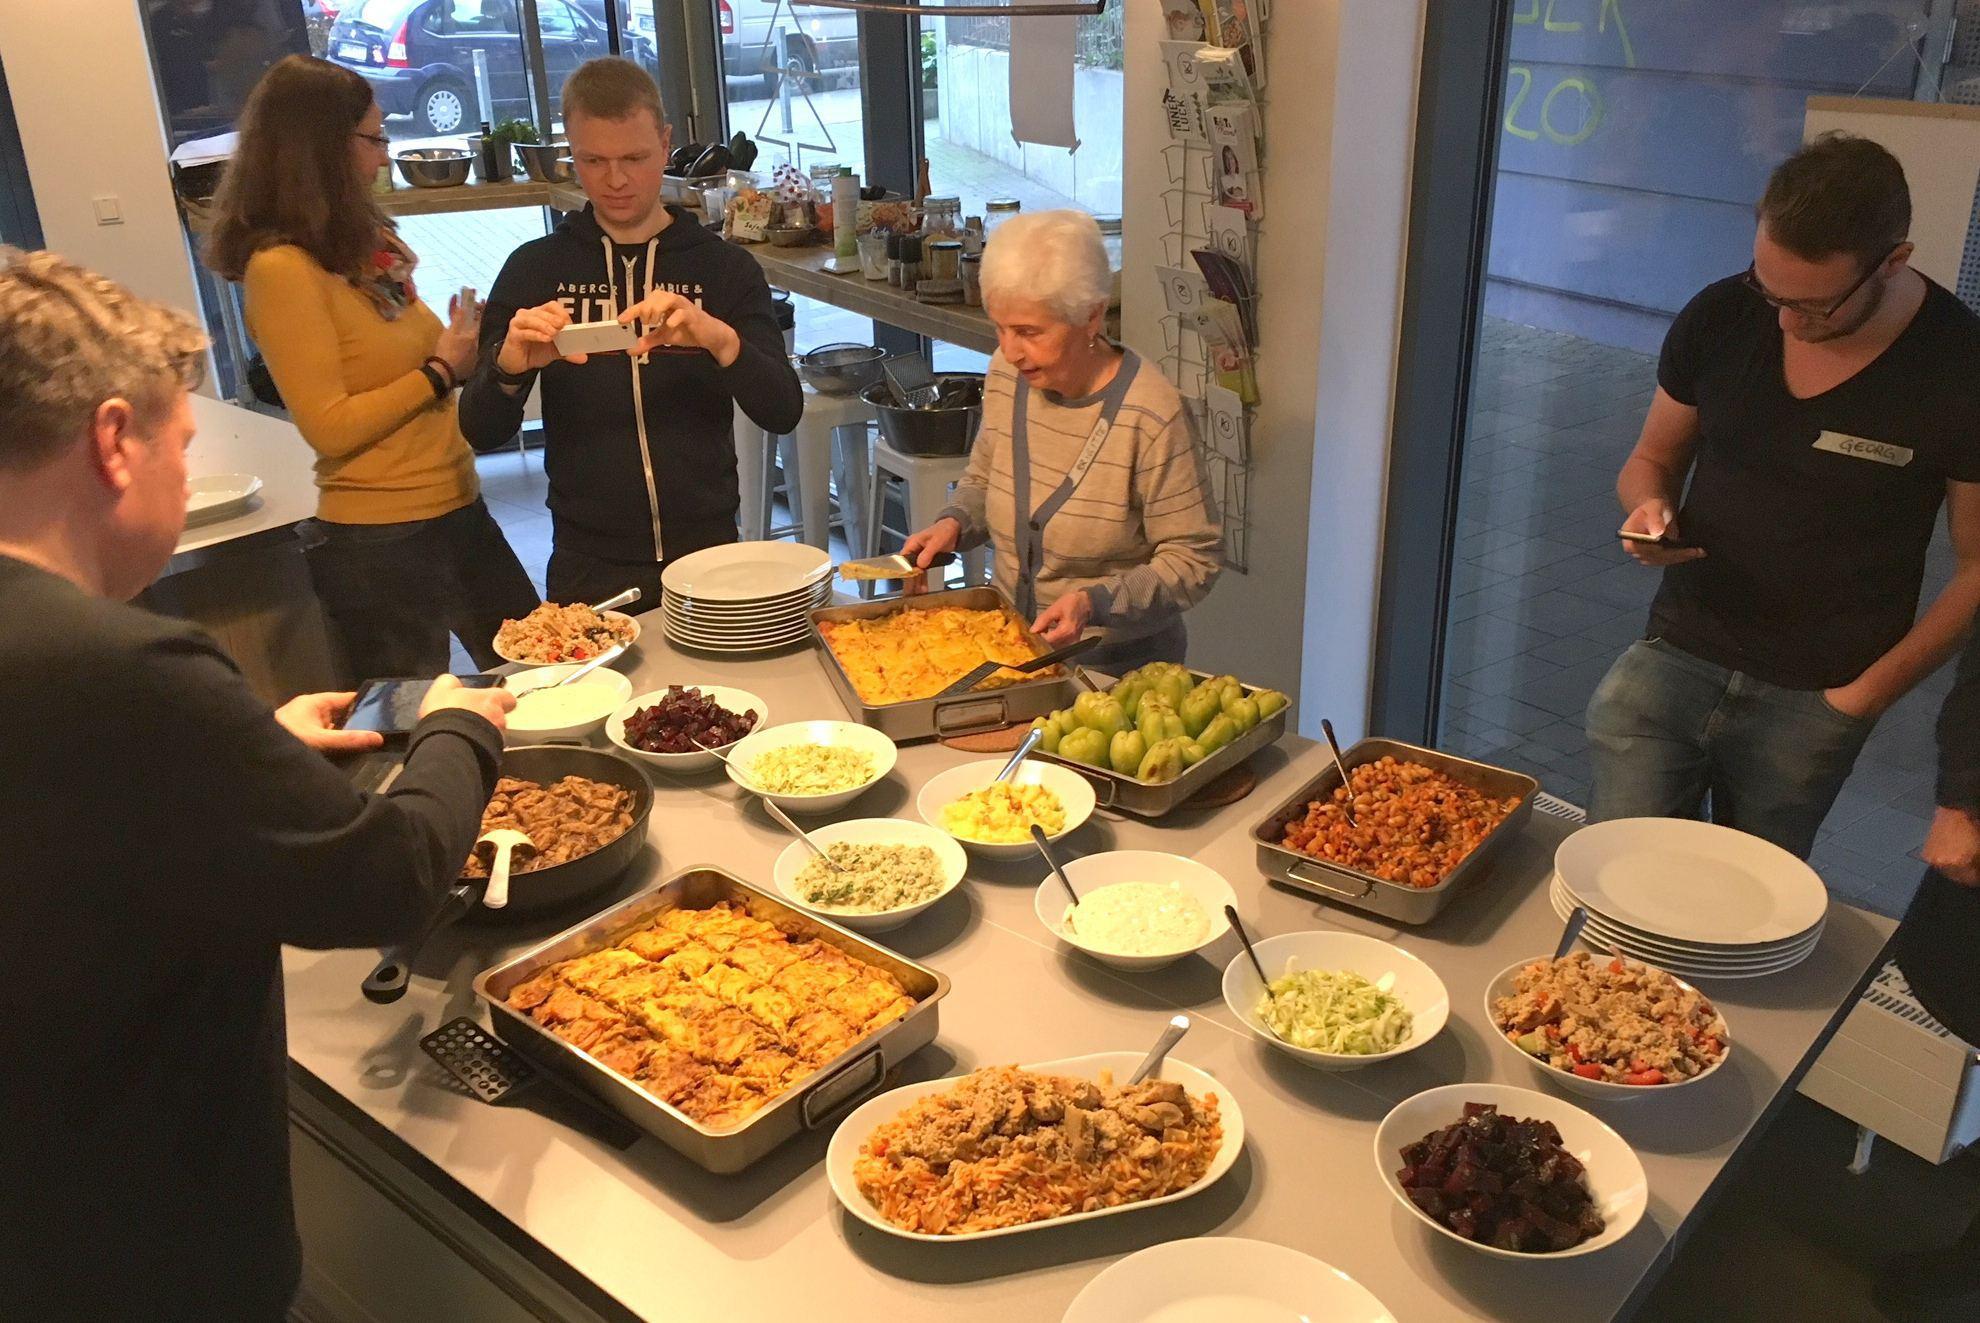 In der Kurkuma Kochschule findet ein Thai Kochkurs statt. Foto: Anke Wistinghausen